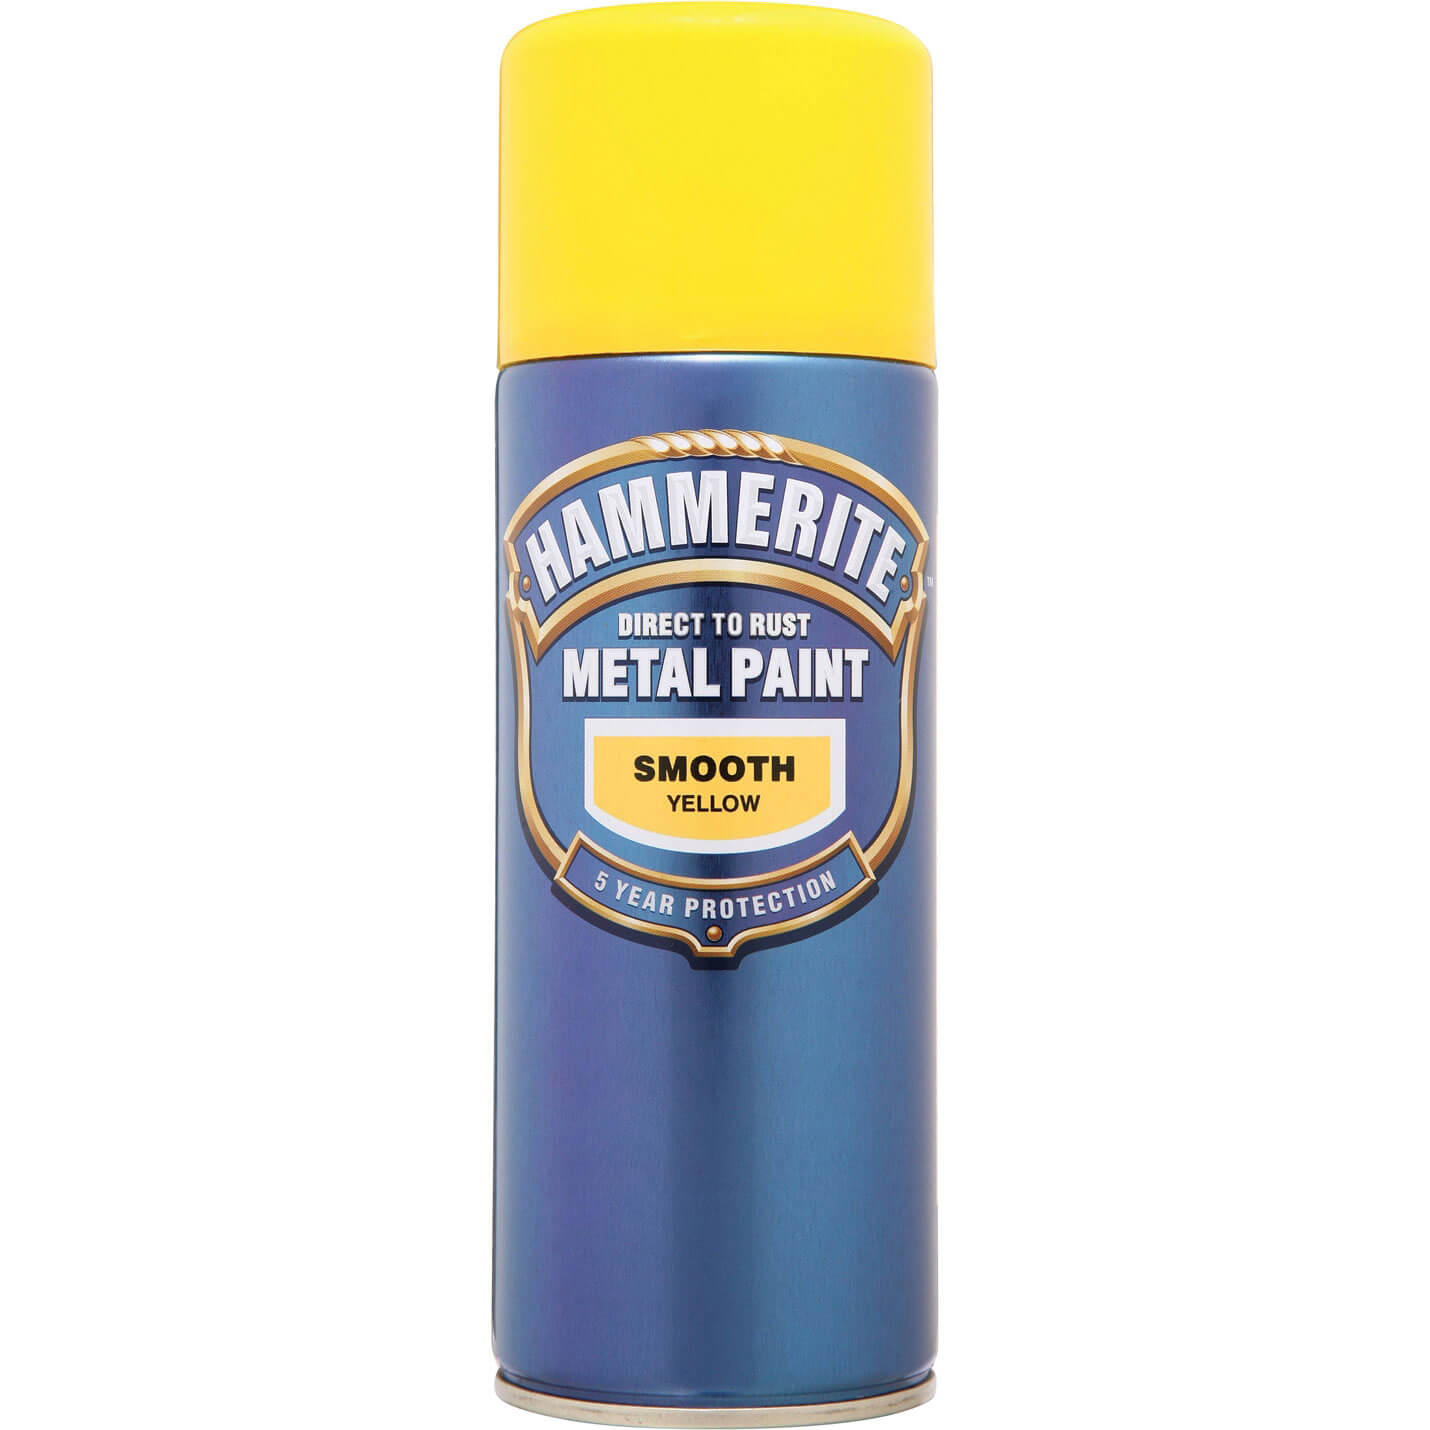 Image of Hammerite Smooth Finish Aerosol Metal Paint Yellow 400ml